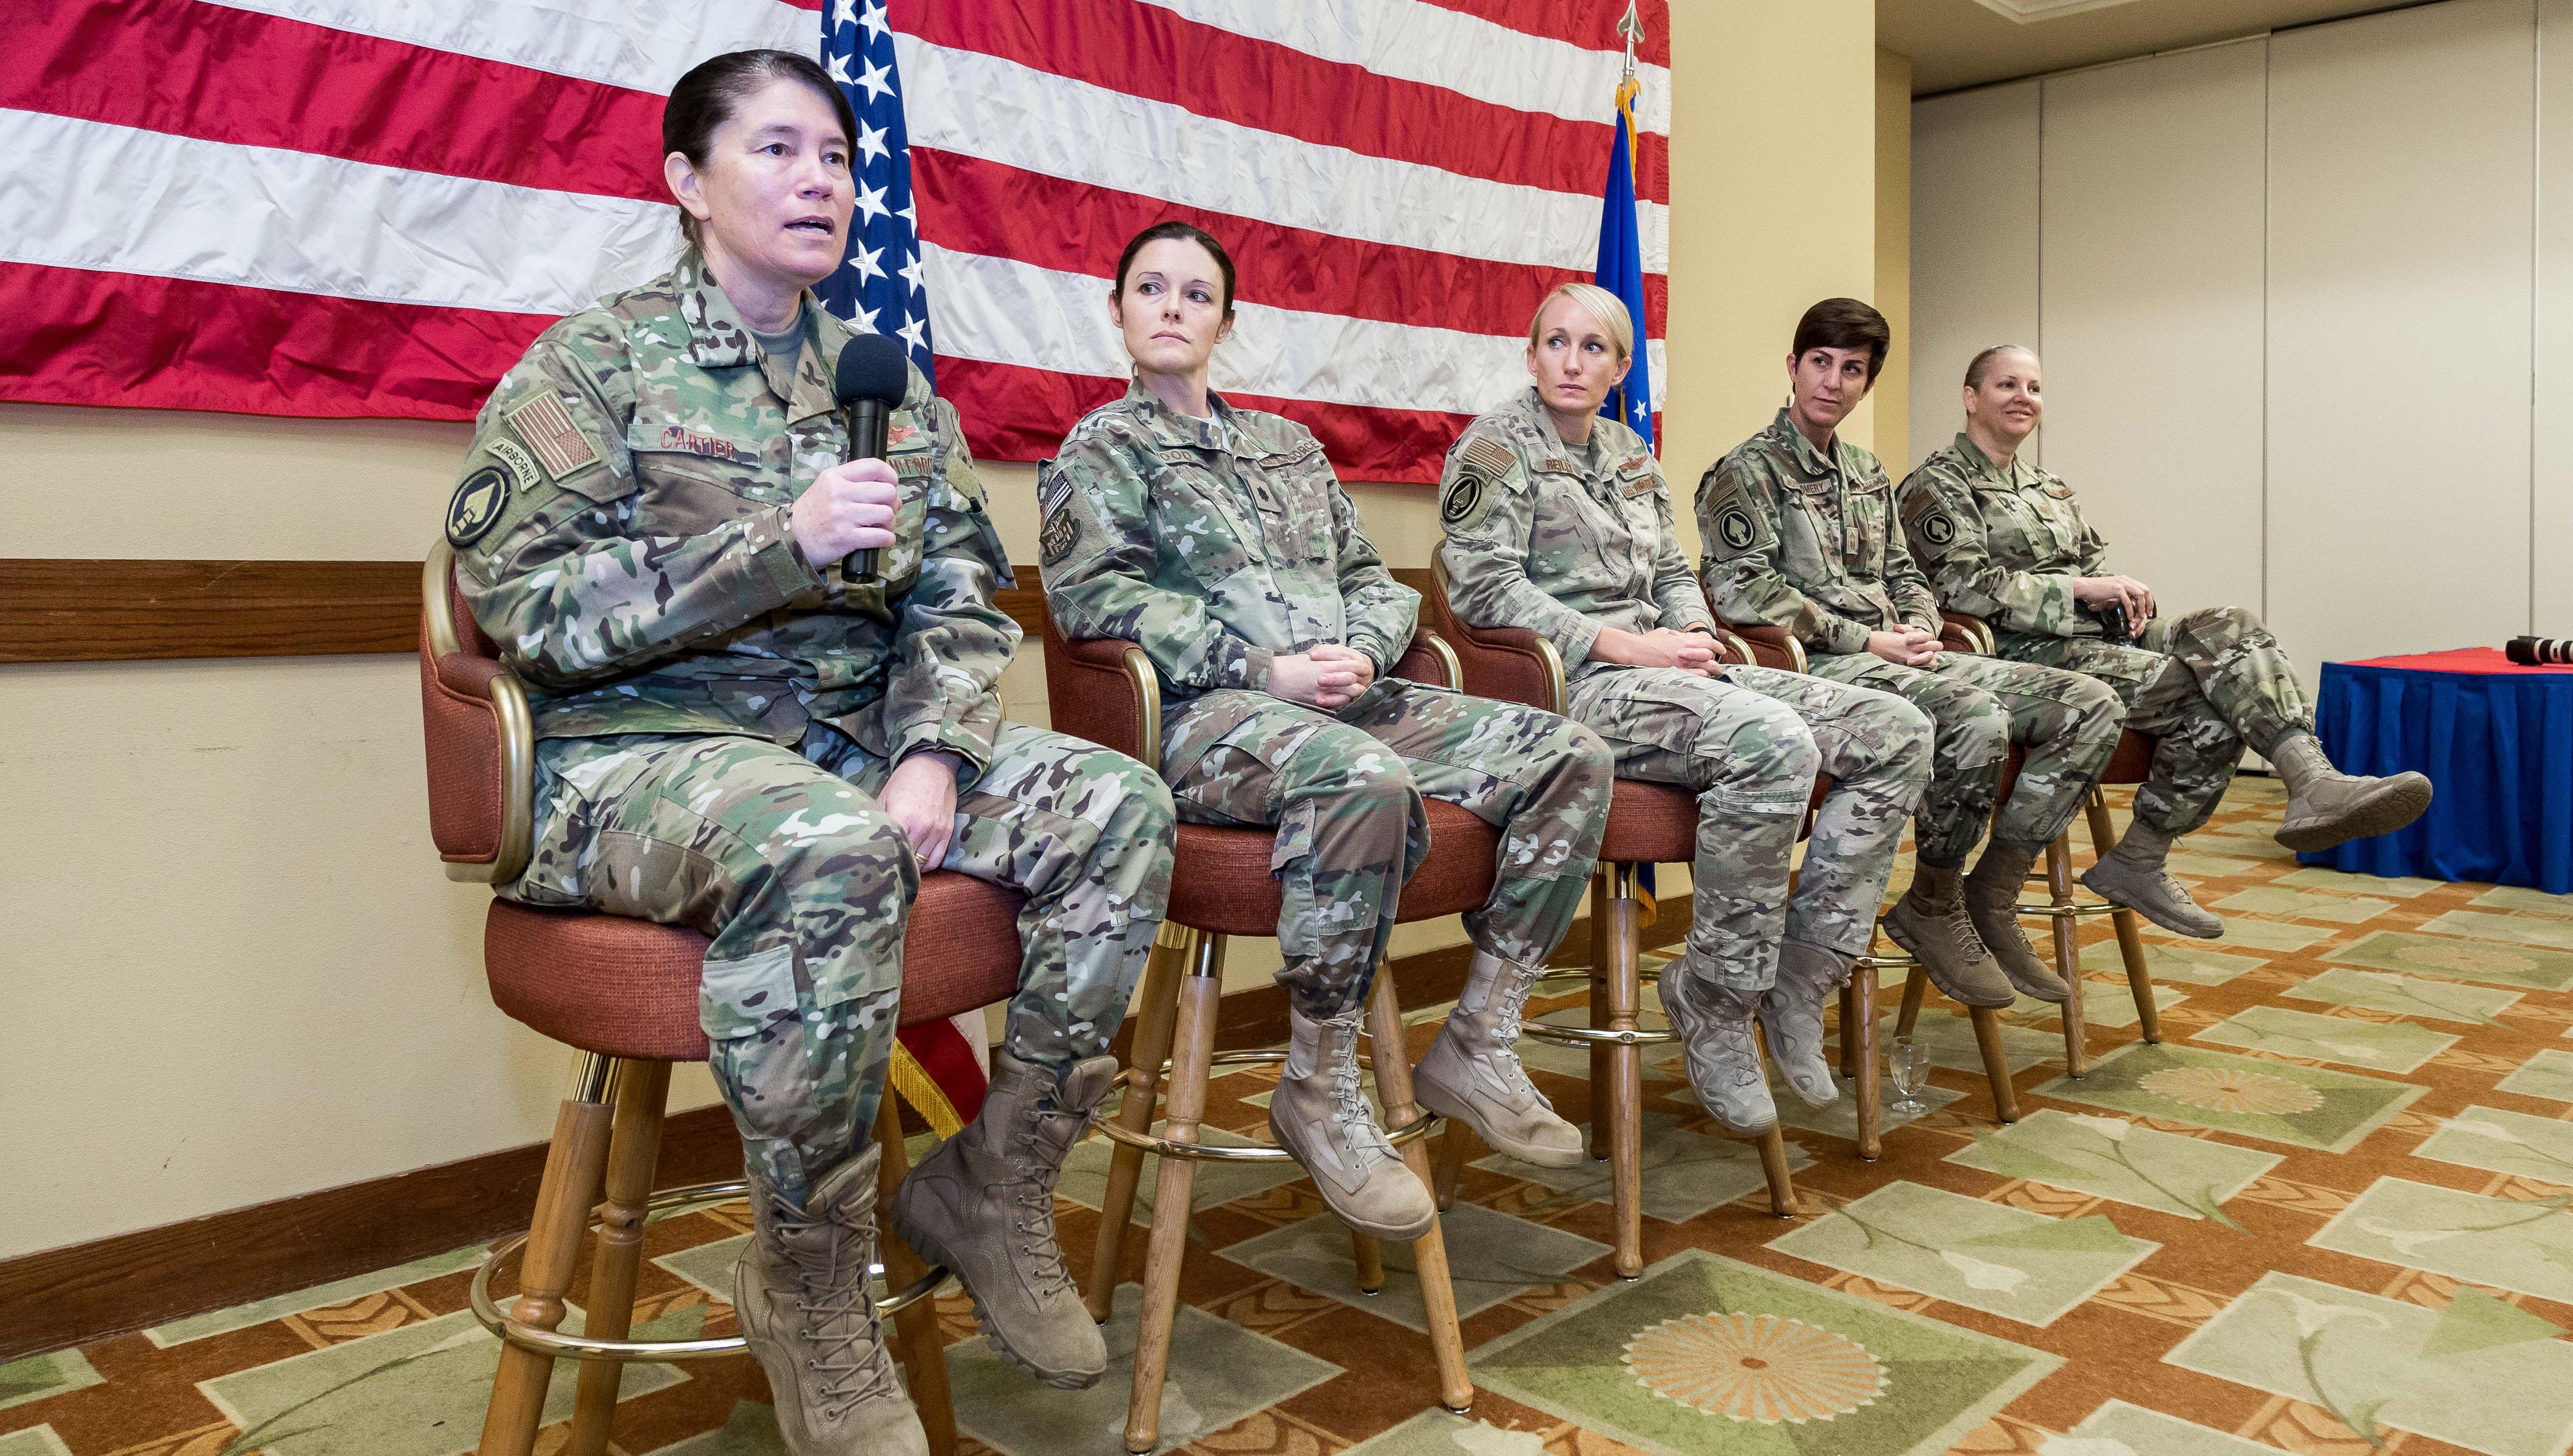 AFSOC leaders speak at women's panel